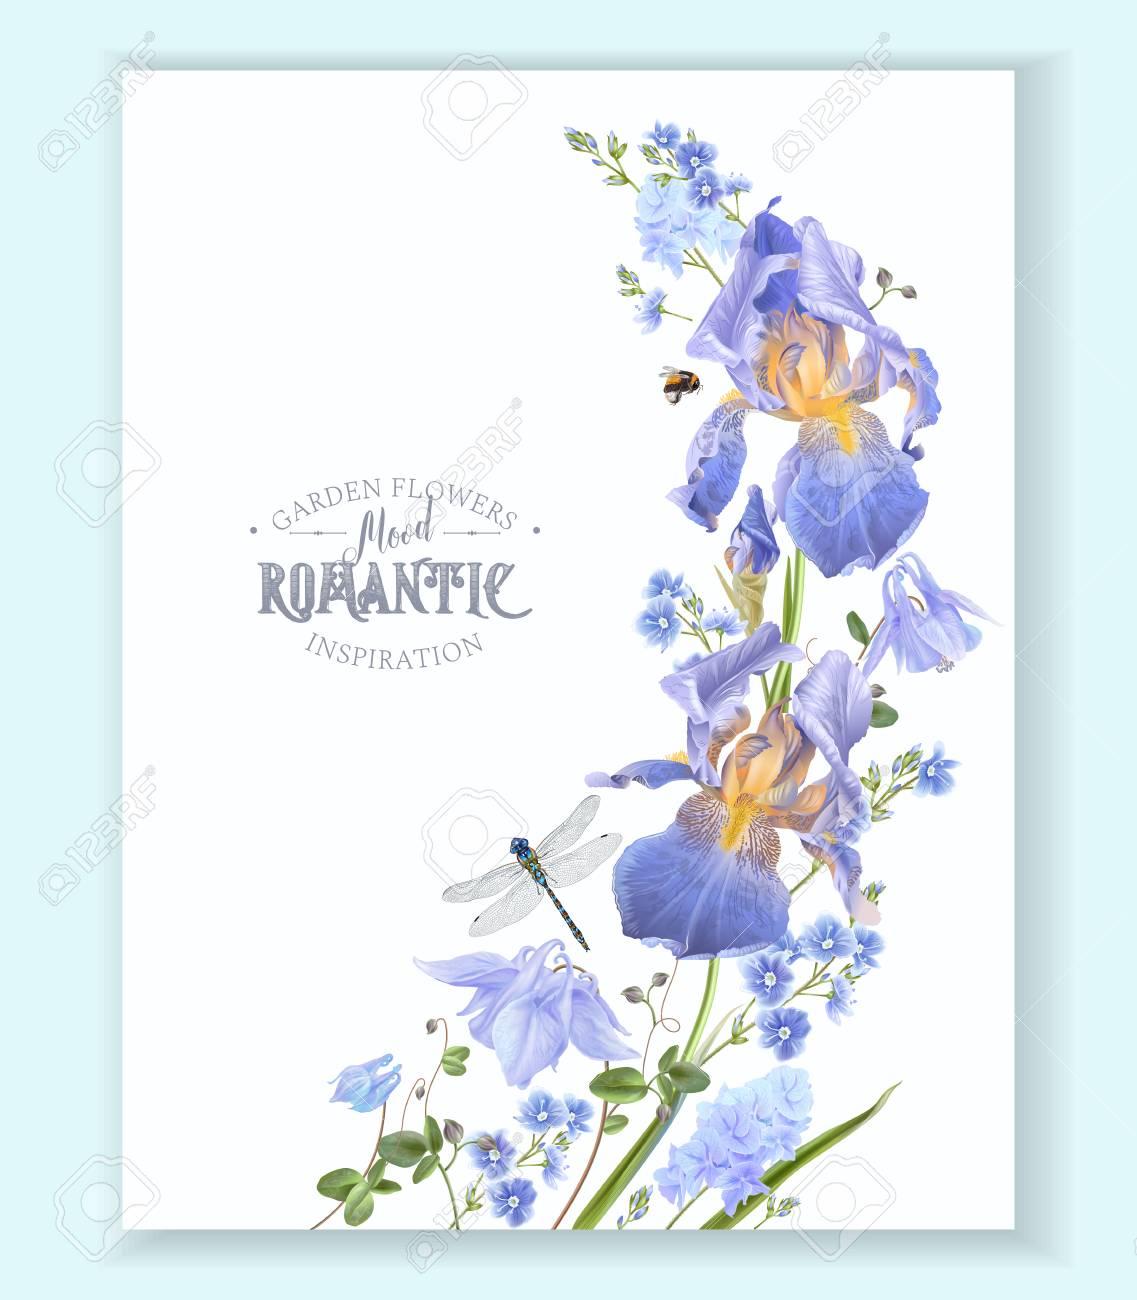 Blue flower wave border illustration on white background. - 97946896